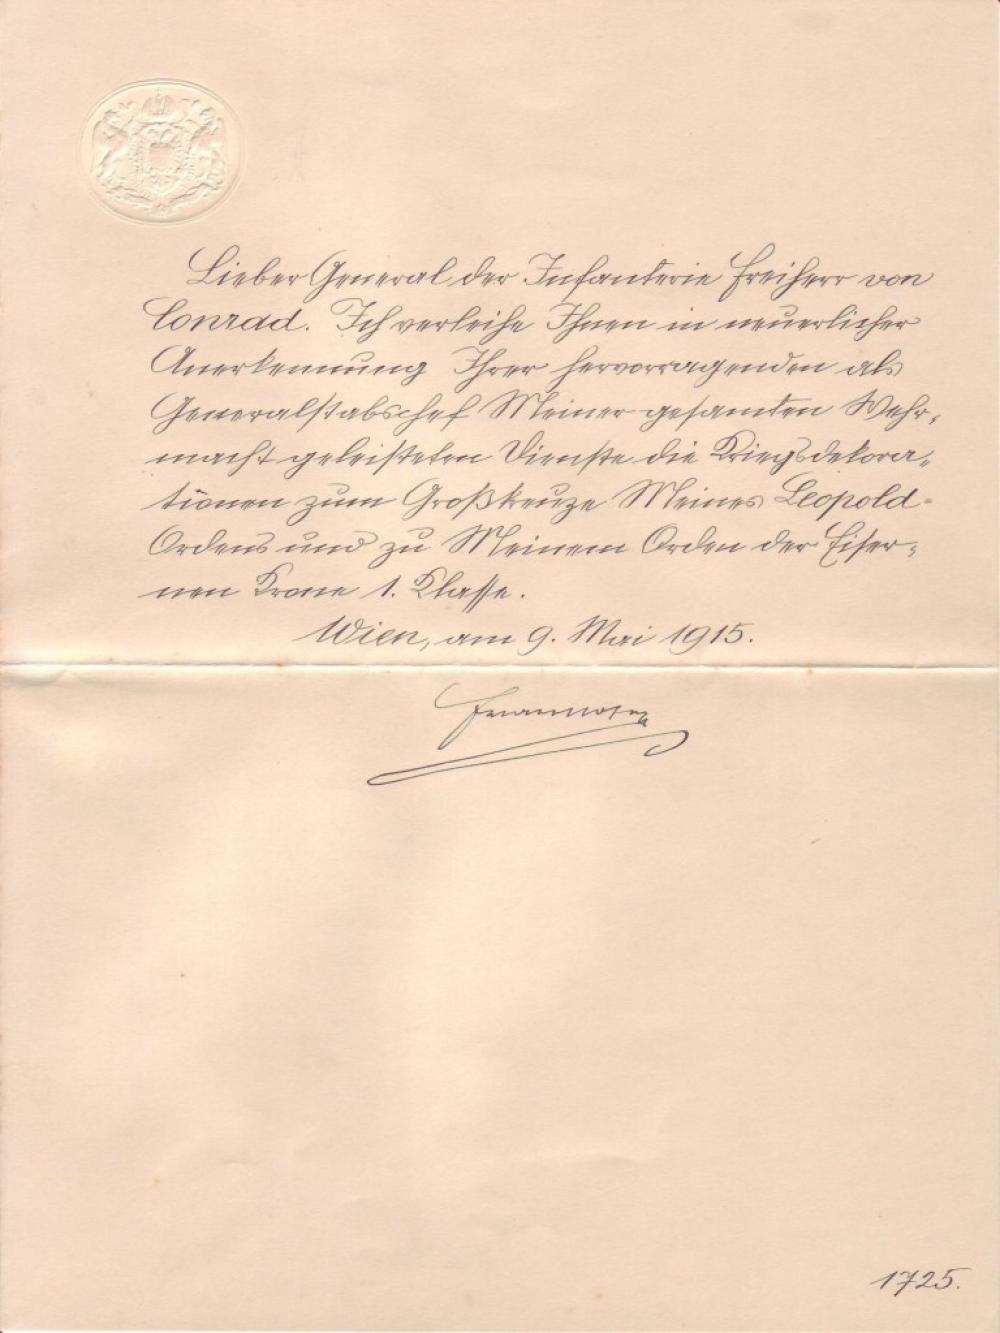 FRANZ JOSEPH I; EMPEROR OF AUSTRIA. Letter Signed, to Count Franz Conrad von Hötzendorf, in German,